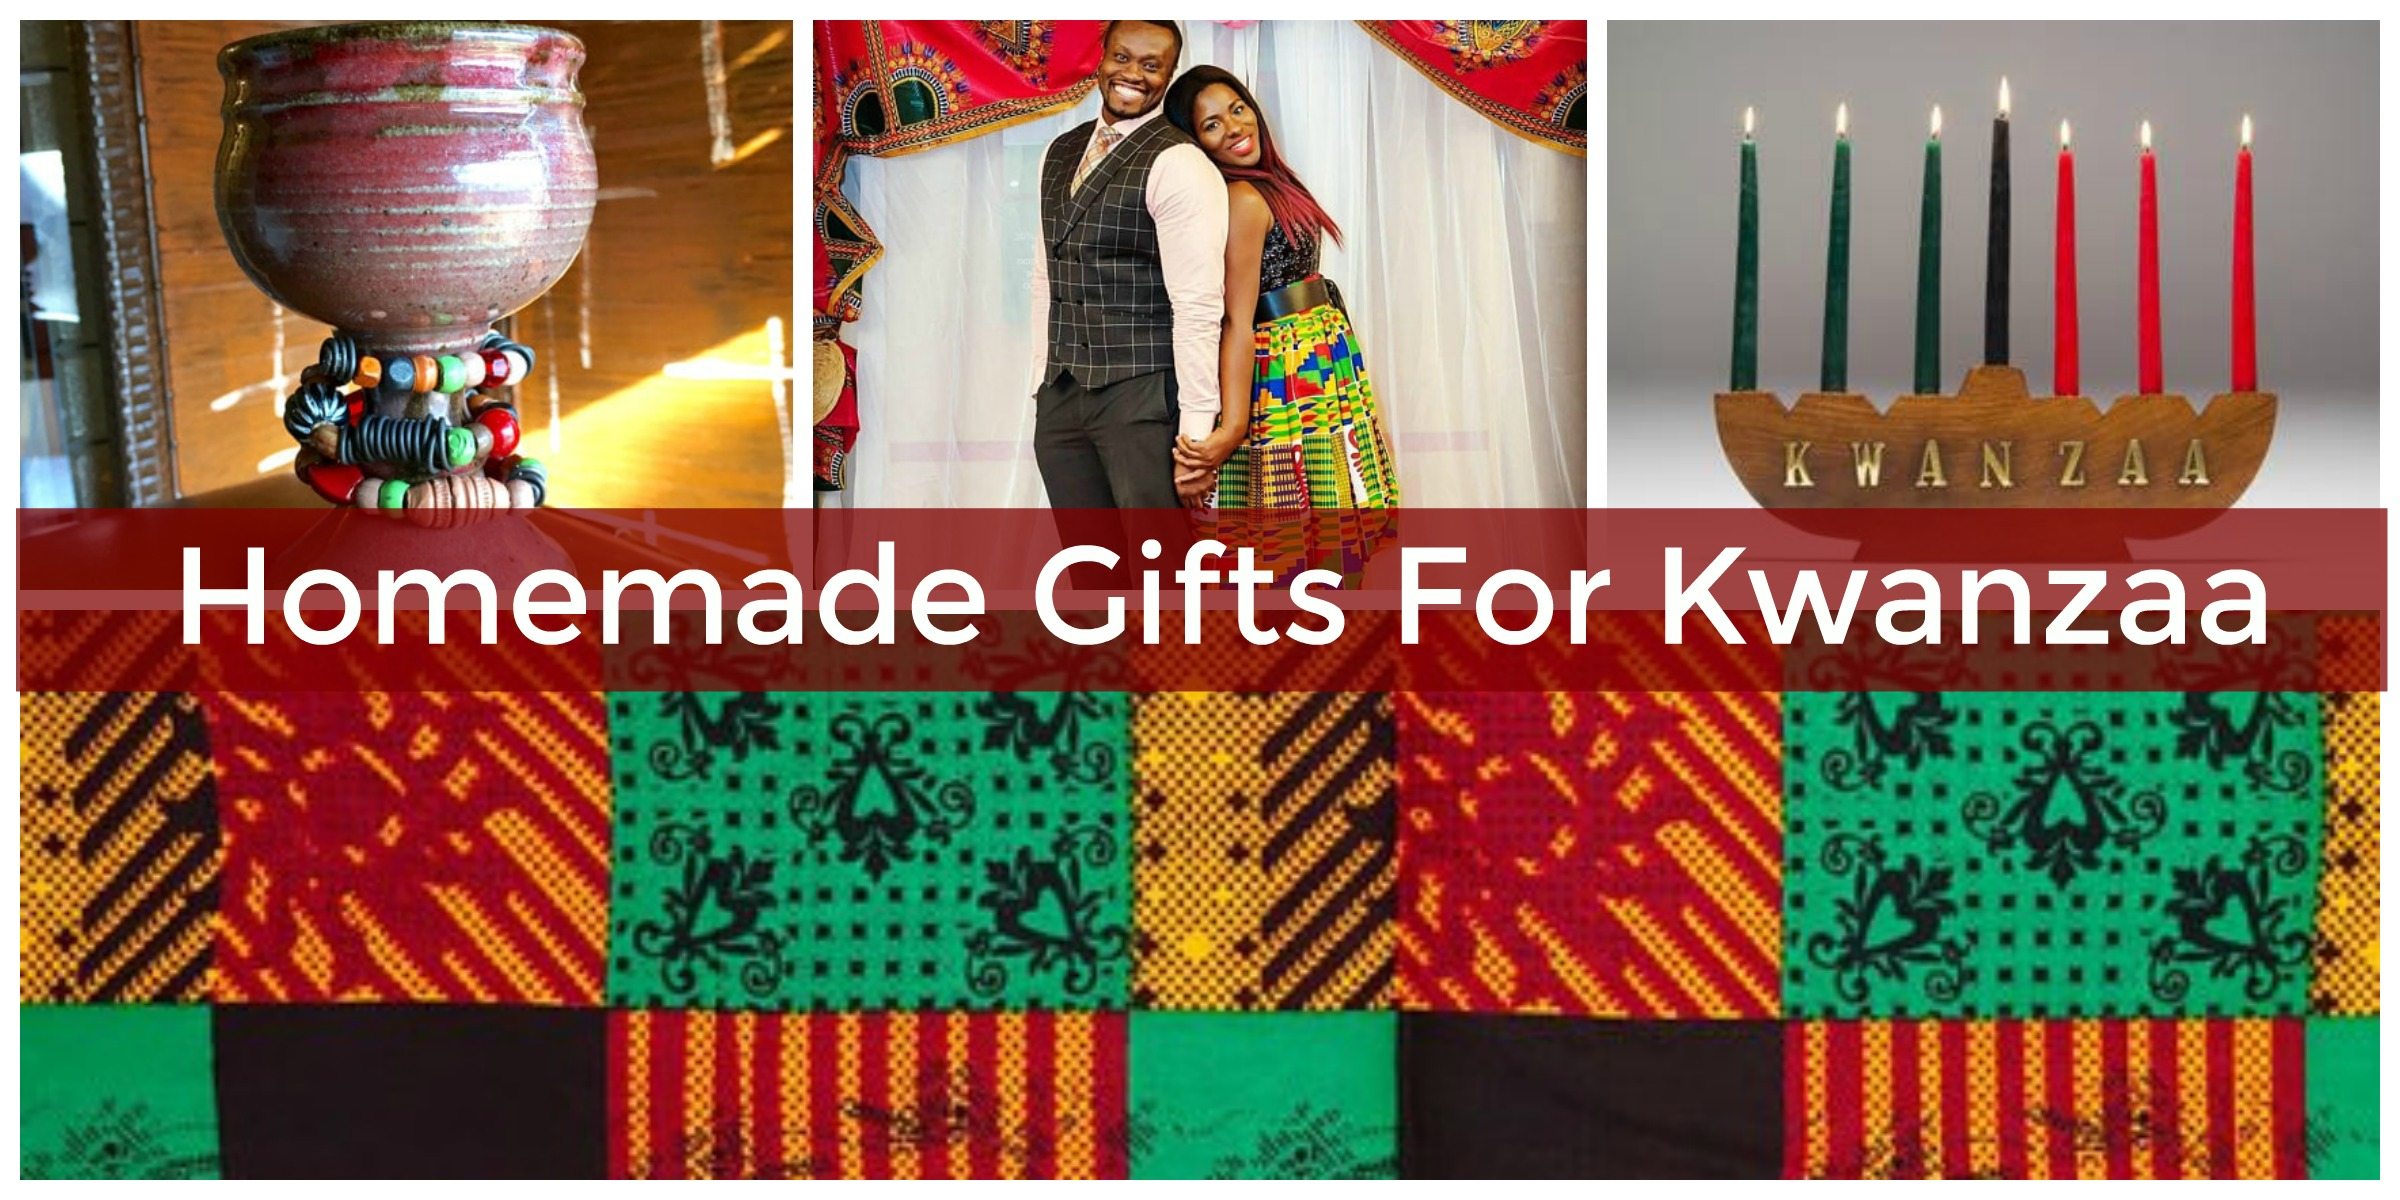 Traditional kwanzaa gift ideas to make homemade negle Choice Image